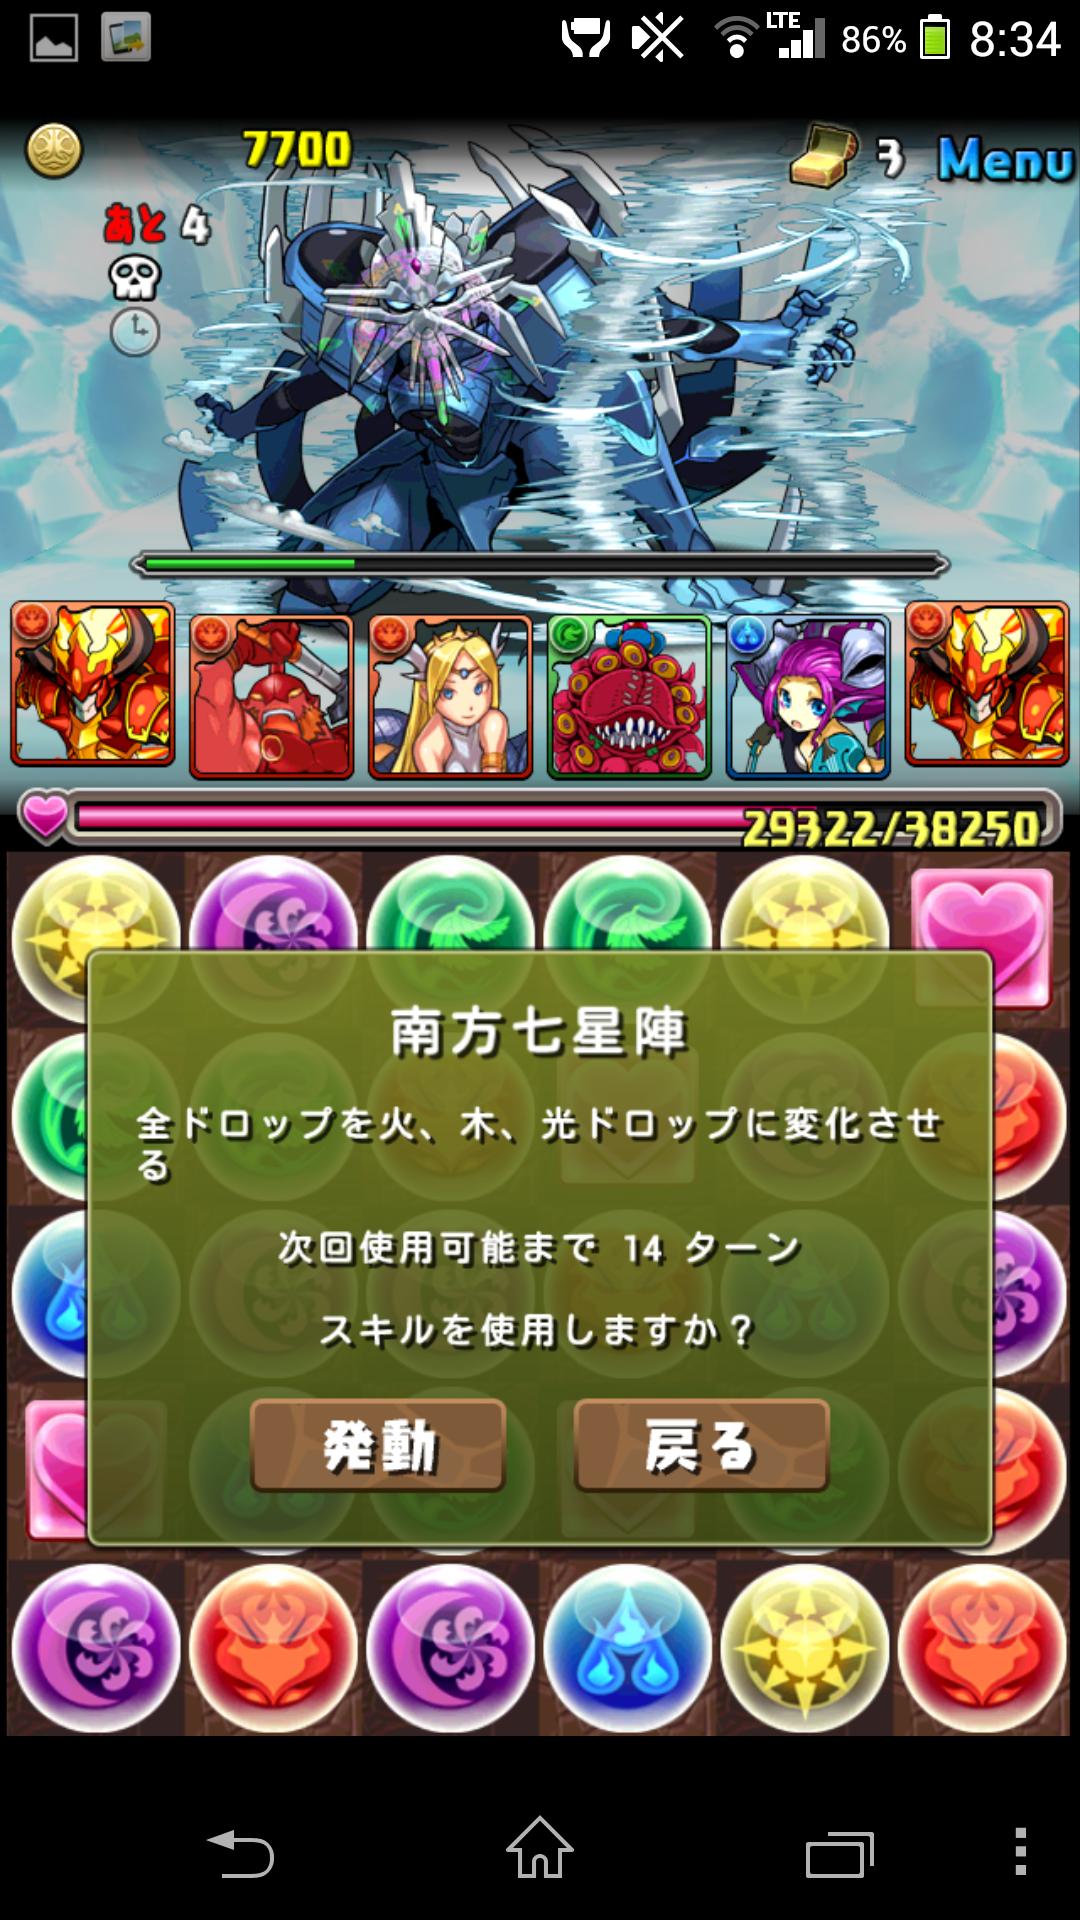 Screenshot_2014-04-04-08-34-31.png